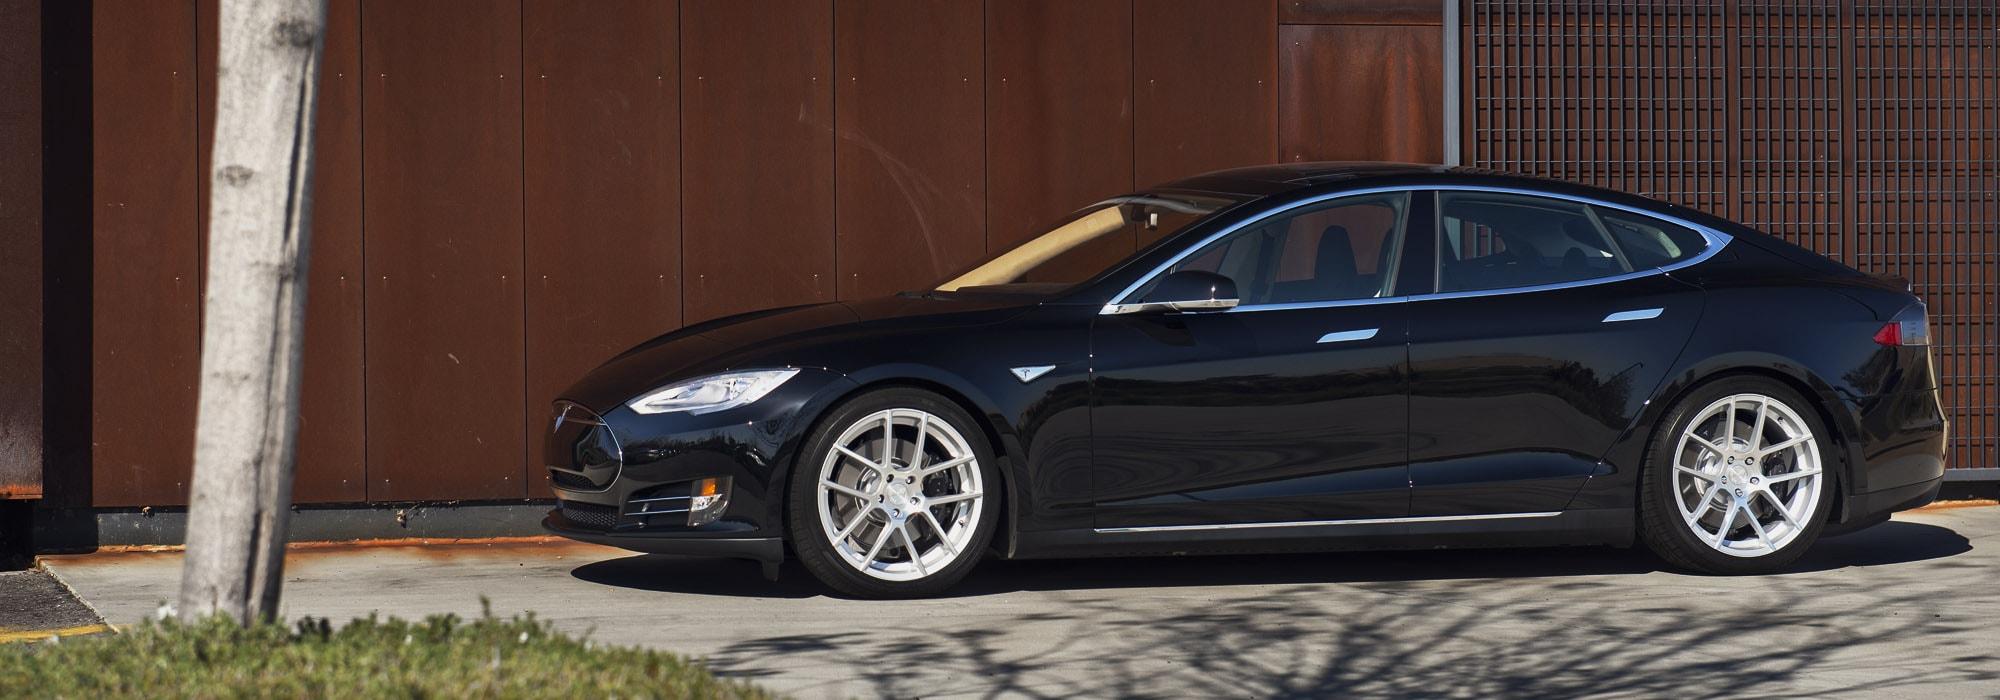 Tesla Model S P85 with 20″ M510 Wheels